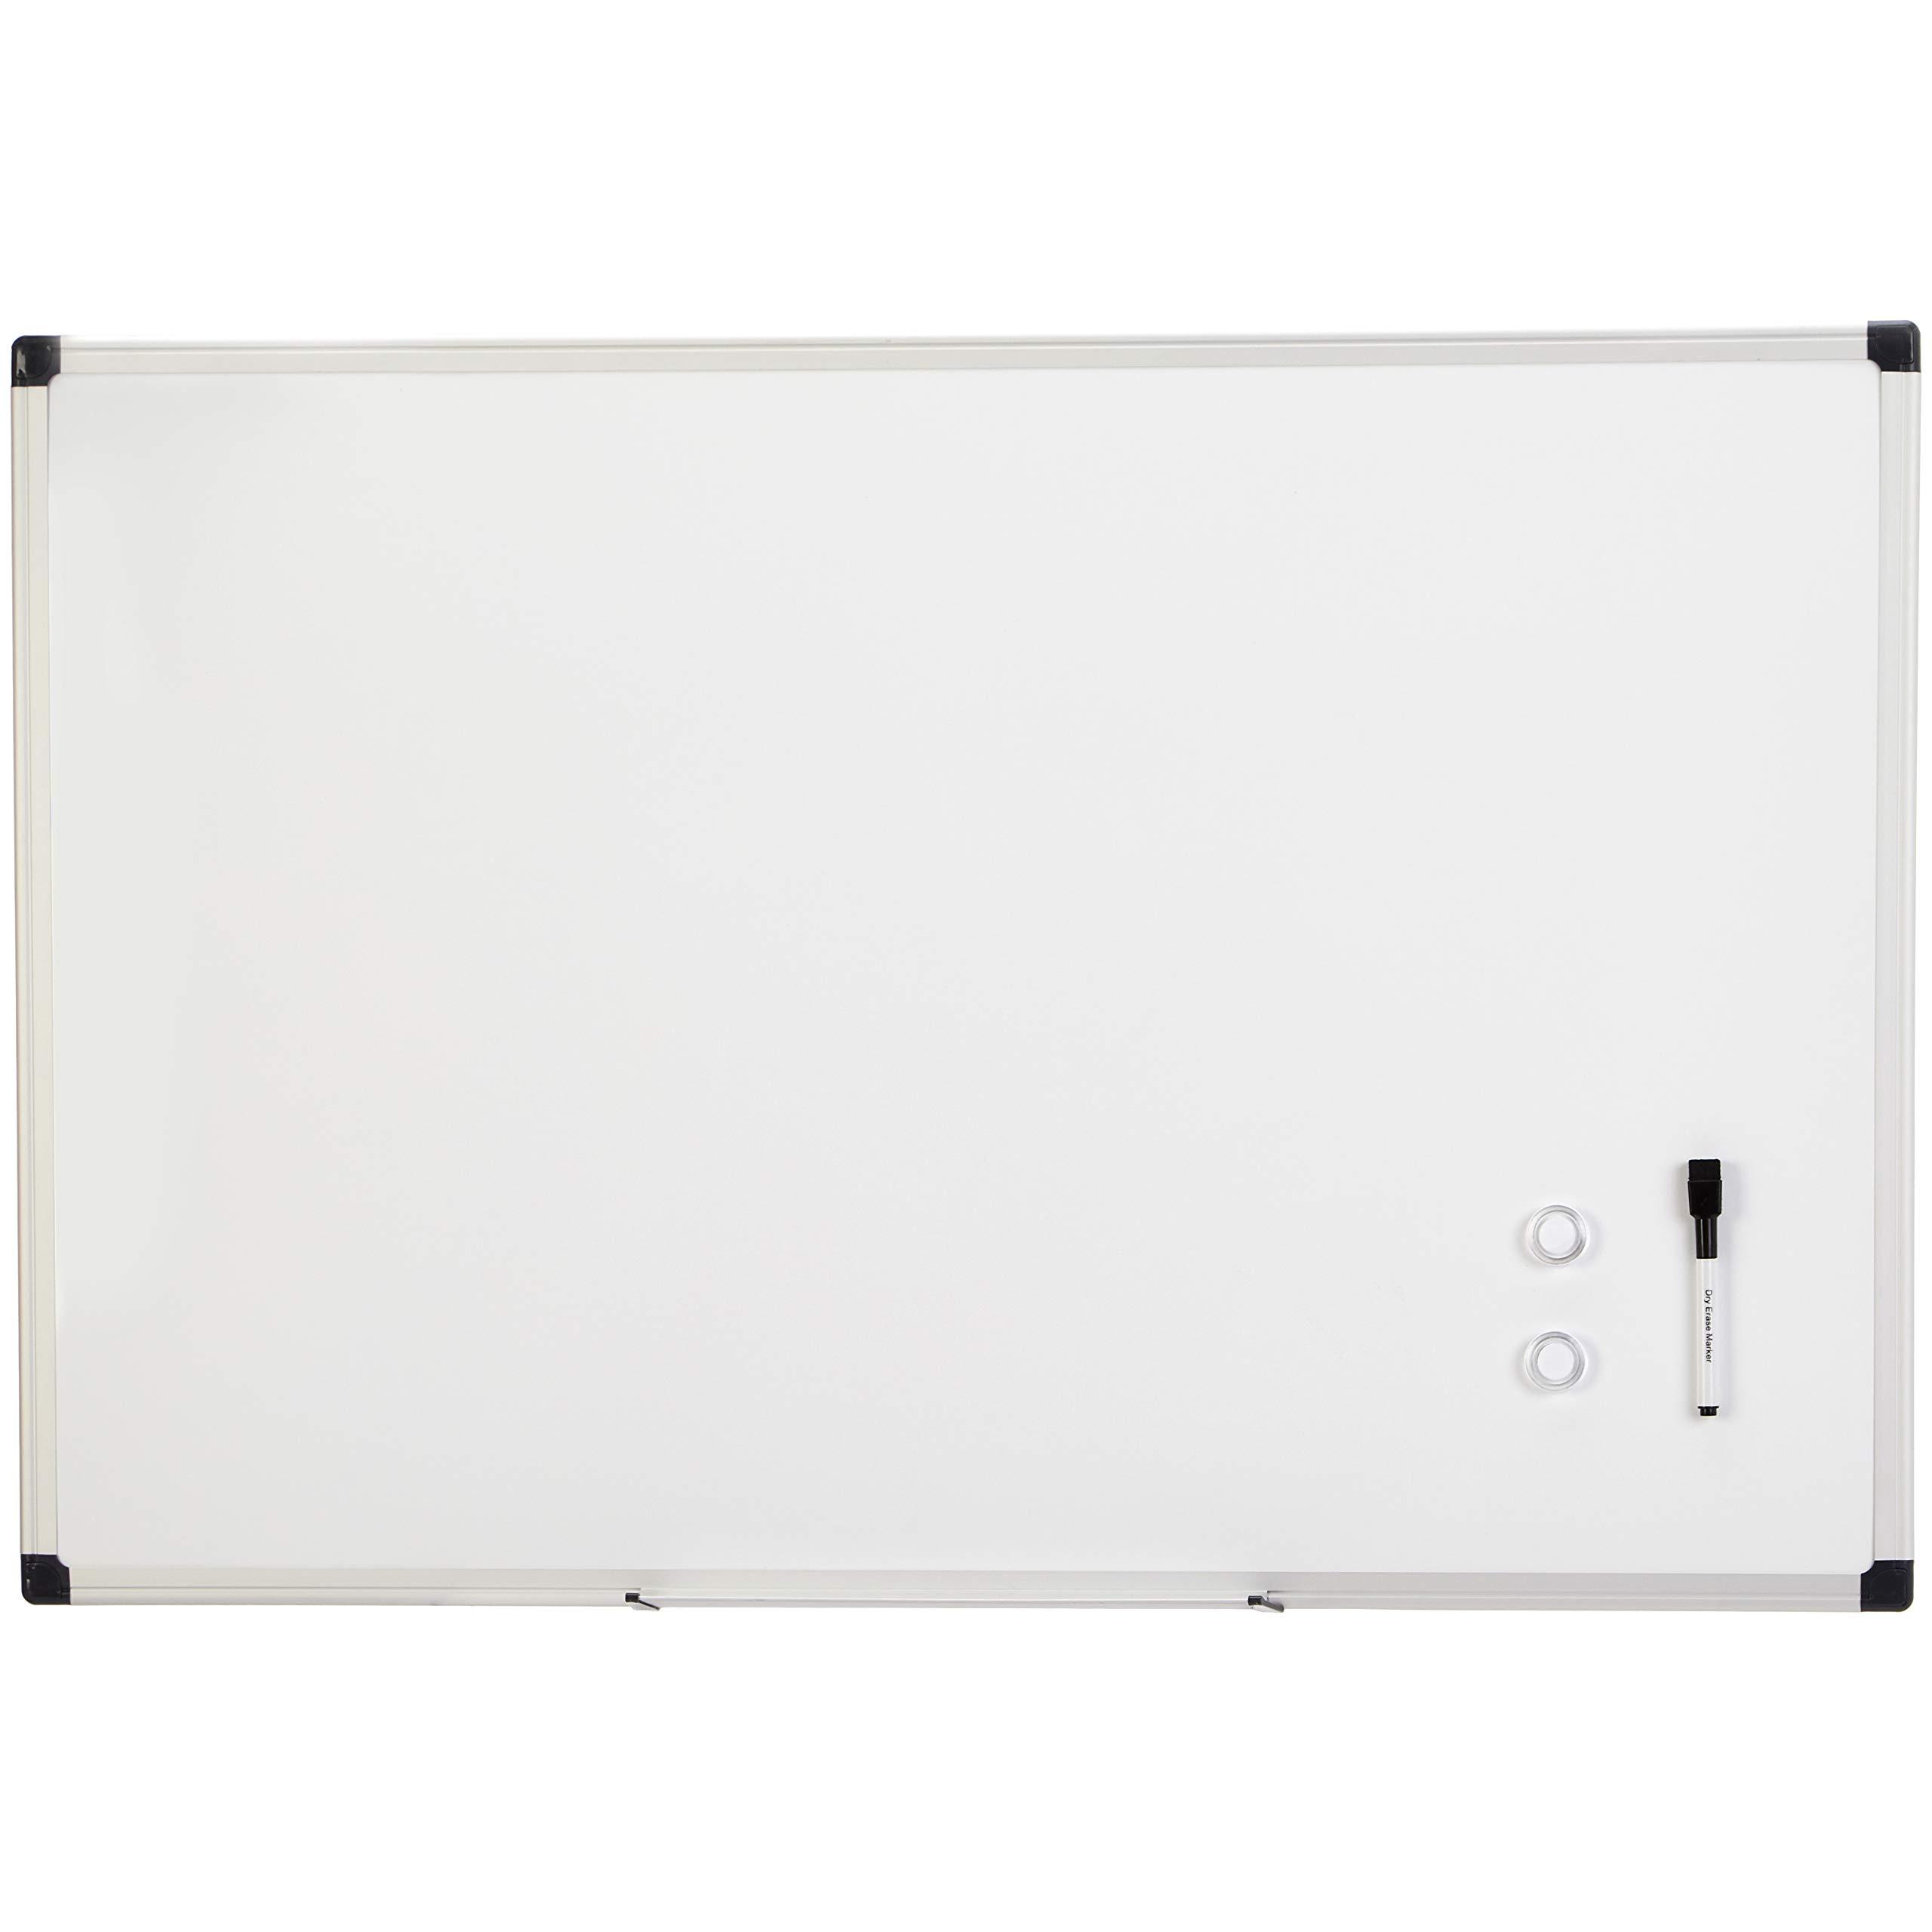 AmazonBasics Magnetic Framed Dry Erase White Board, 24 x 36 Inch by AmazonBasics